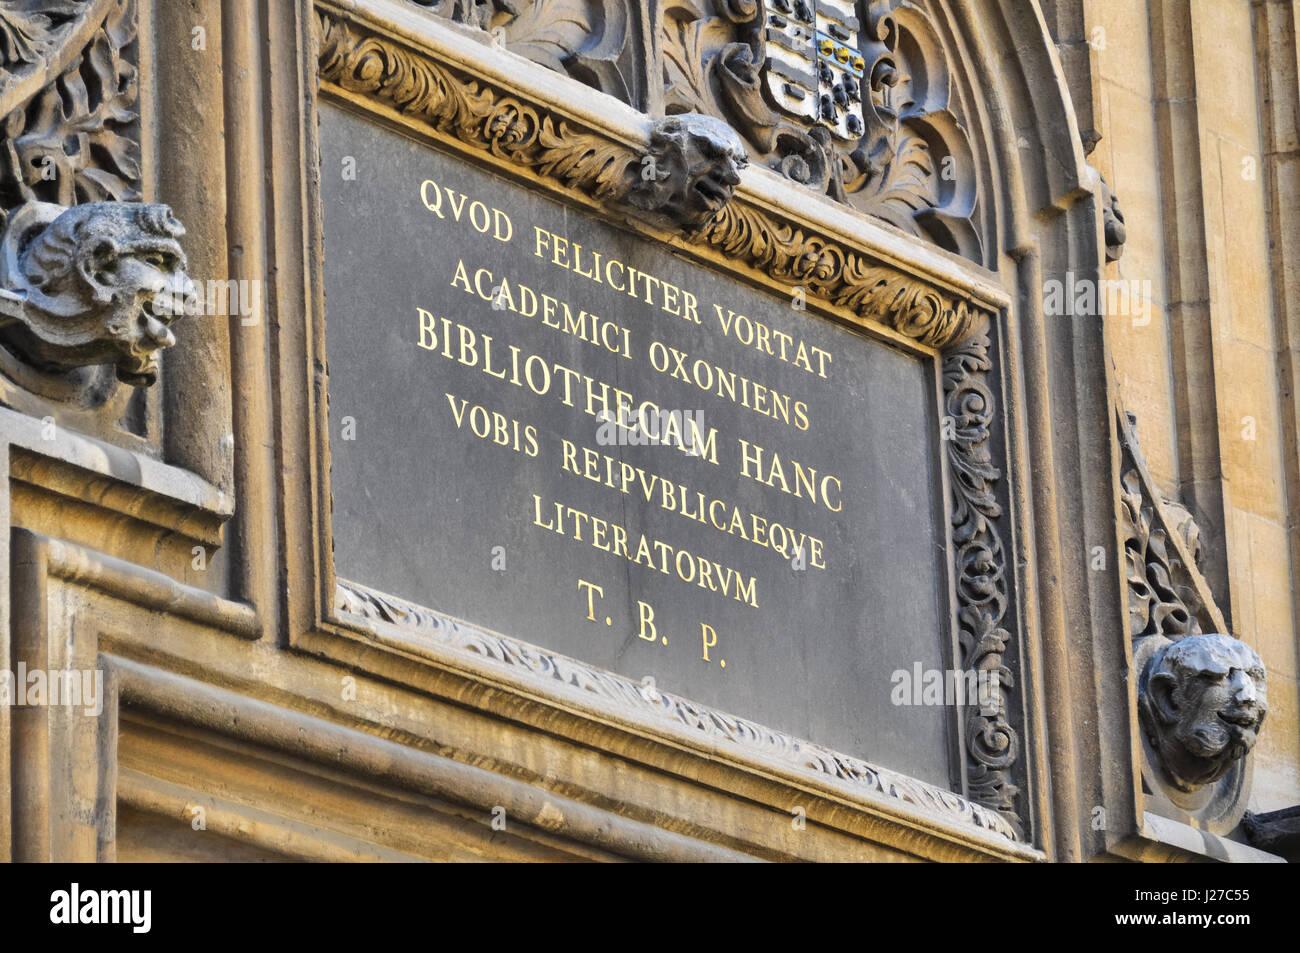 bodleian-library-latin-sign-detail-oxford-university-united-kingdom-J27C55.jpg